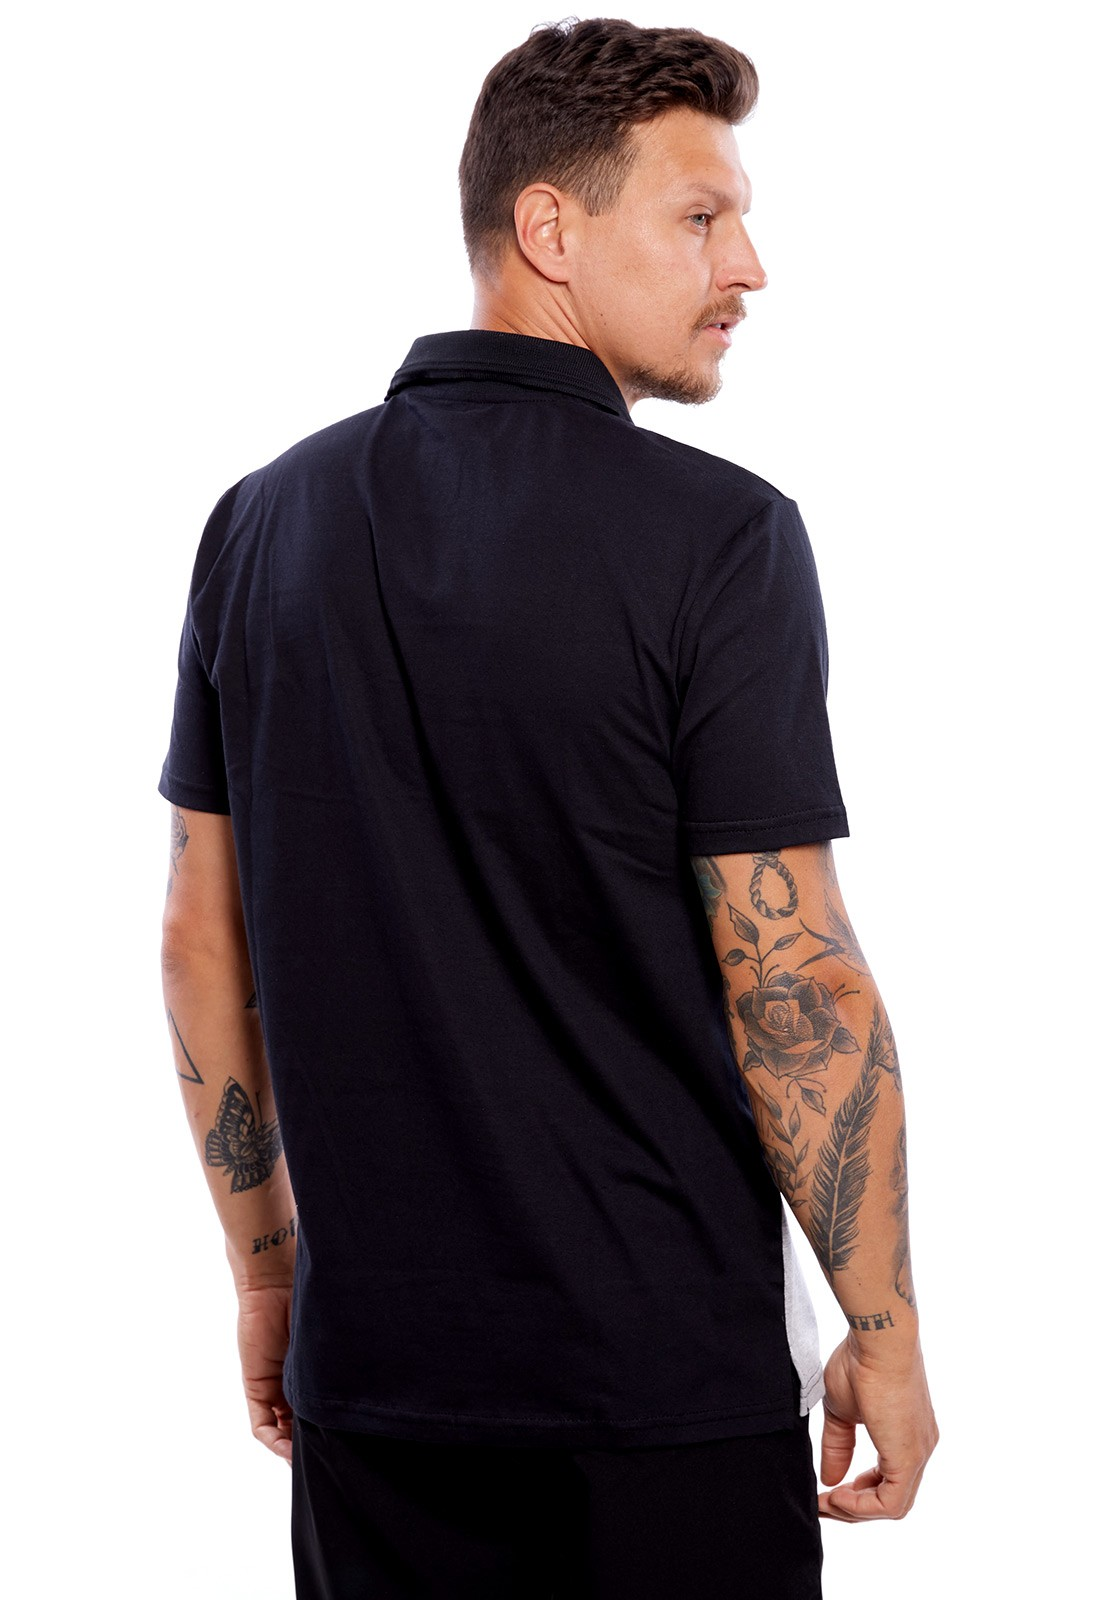 Camisa Polo Vida Marinha Manga Curta Cinza/Preto